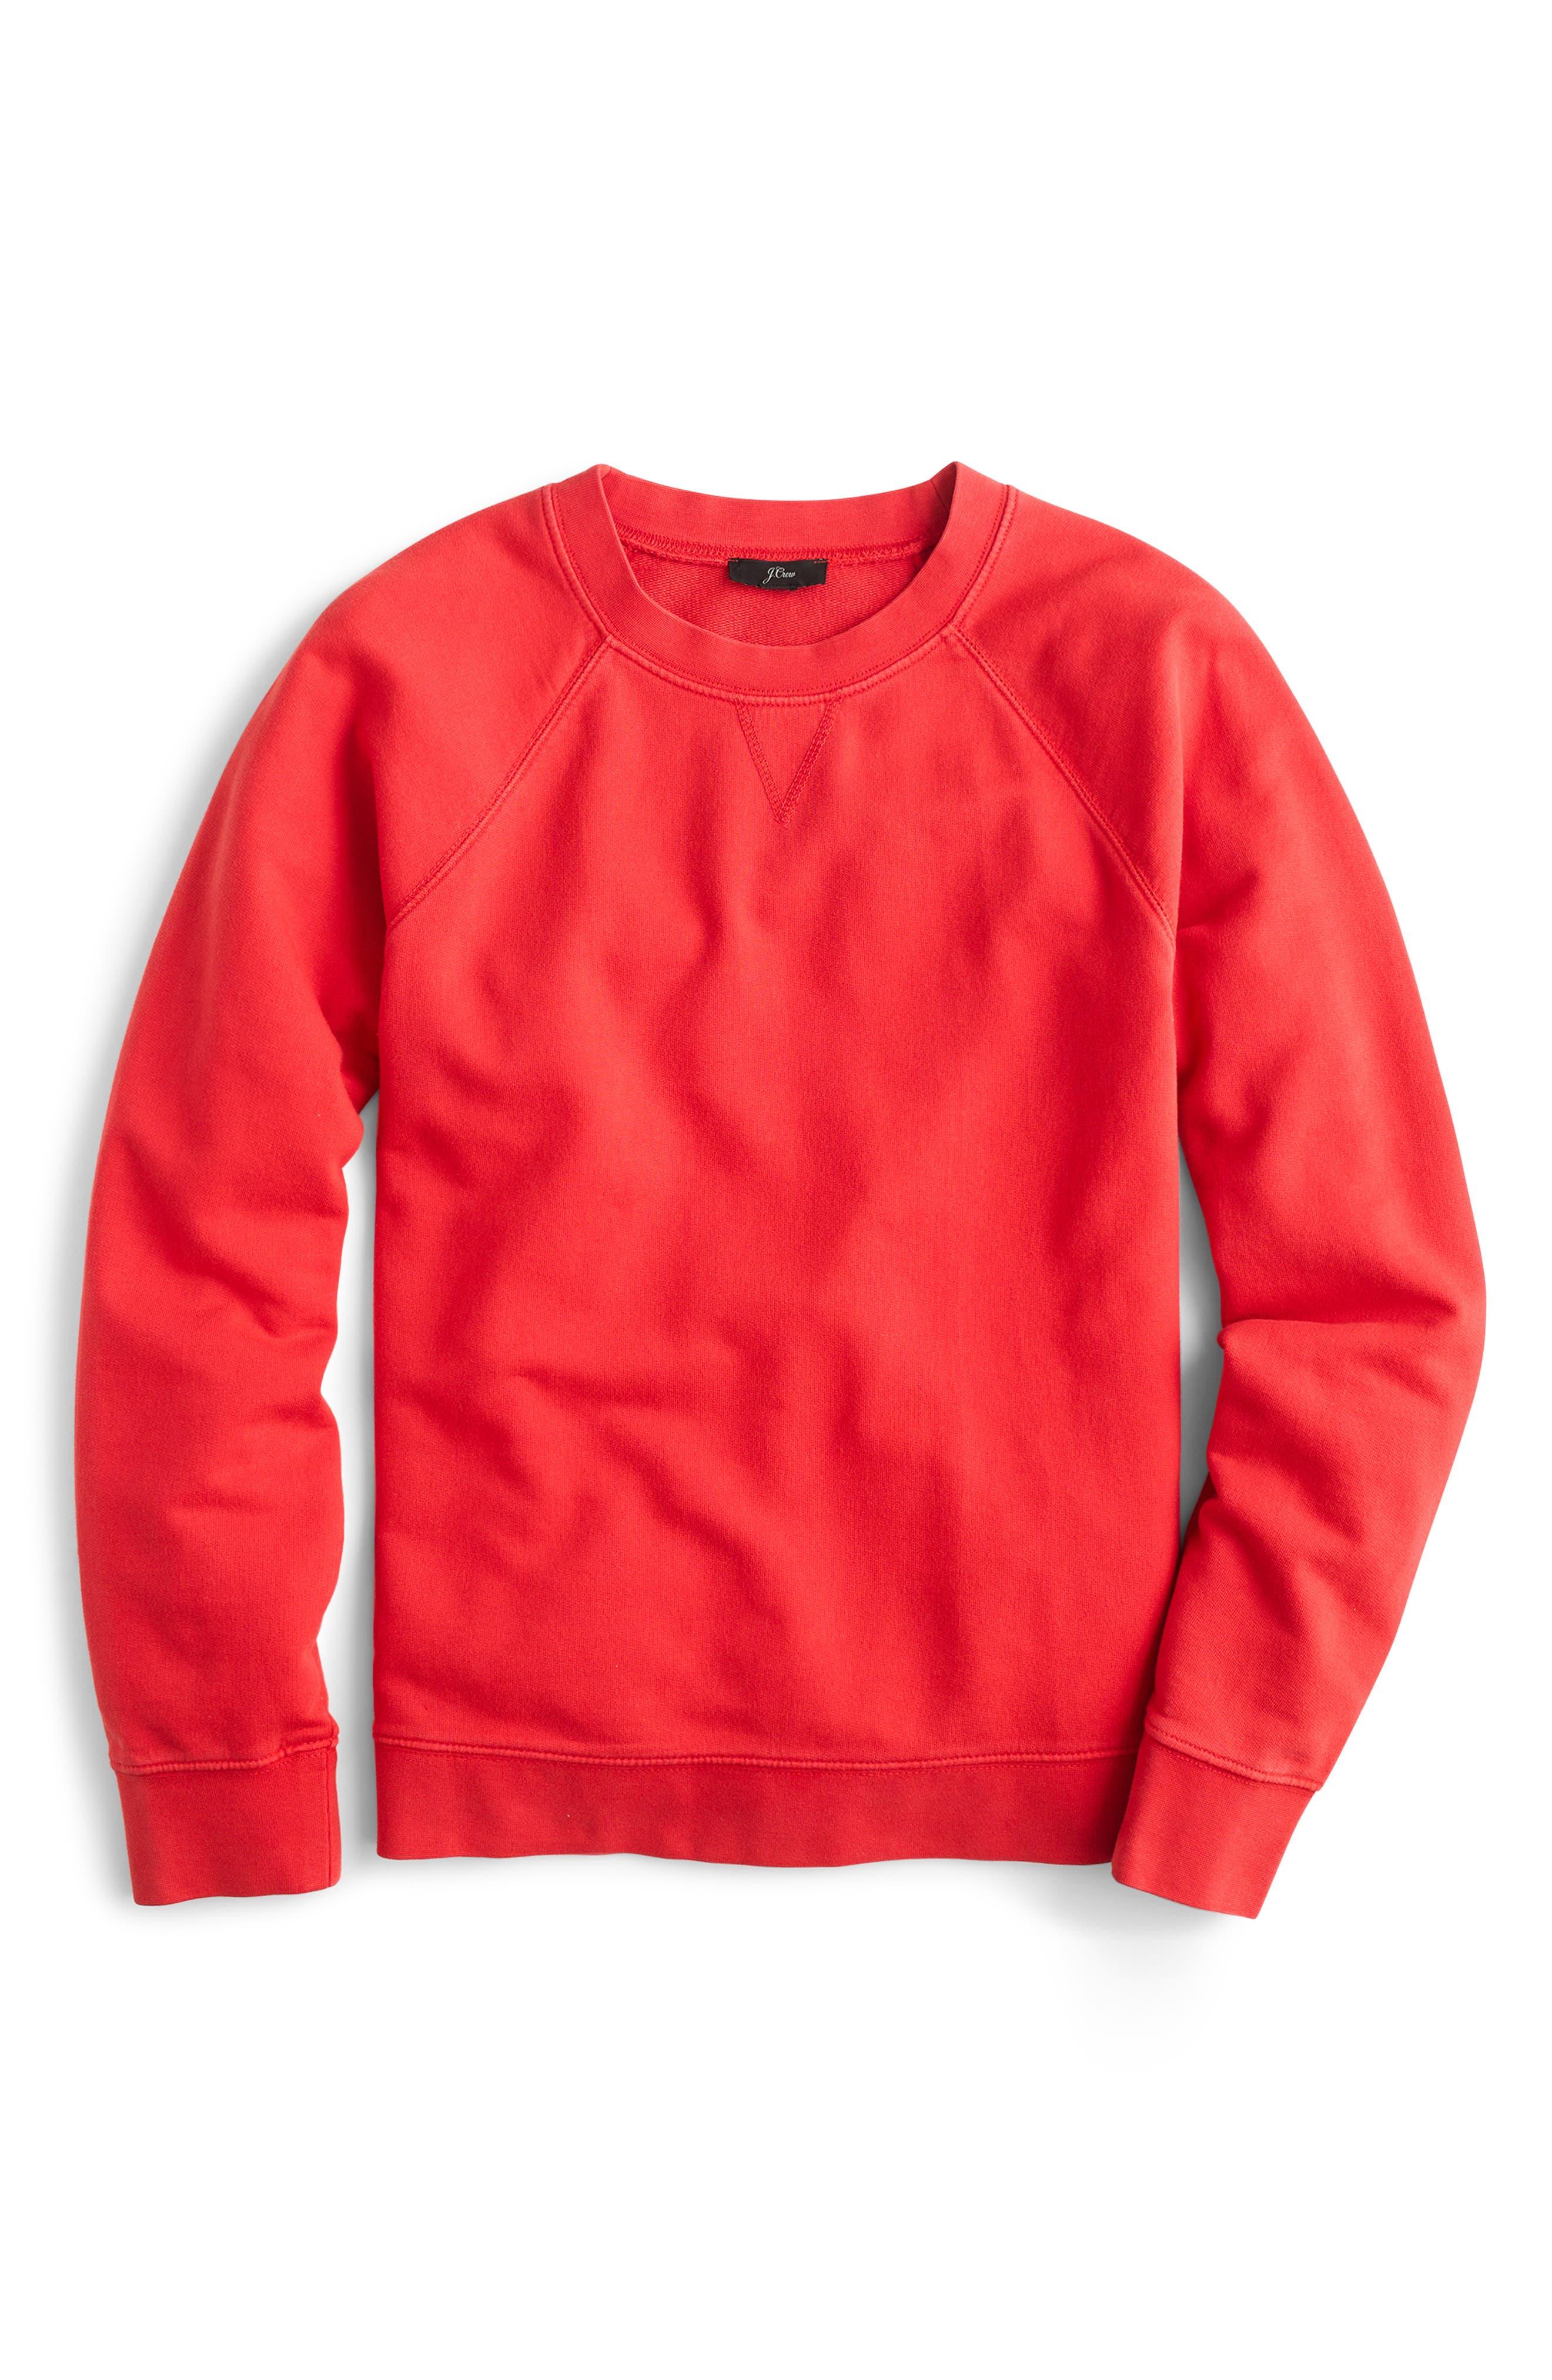 J.crew Garment Dyed Sweatshirt, Red